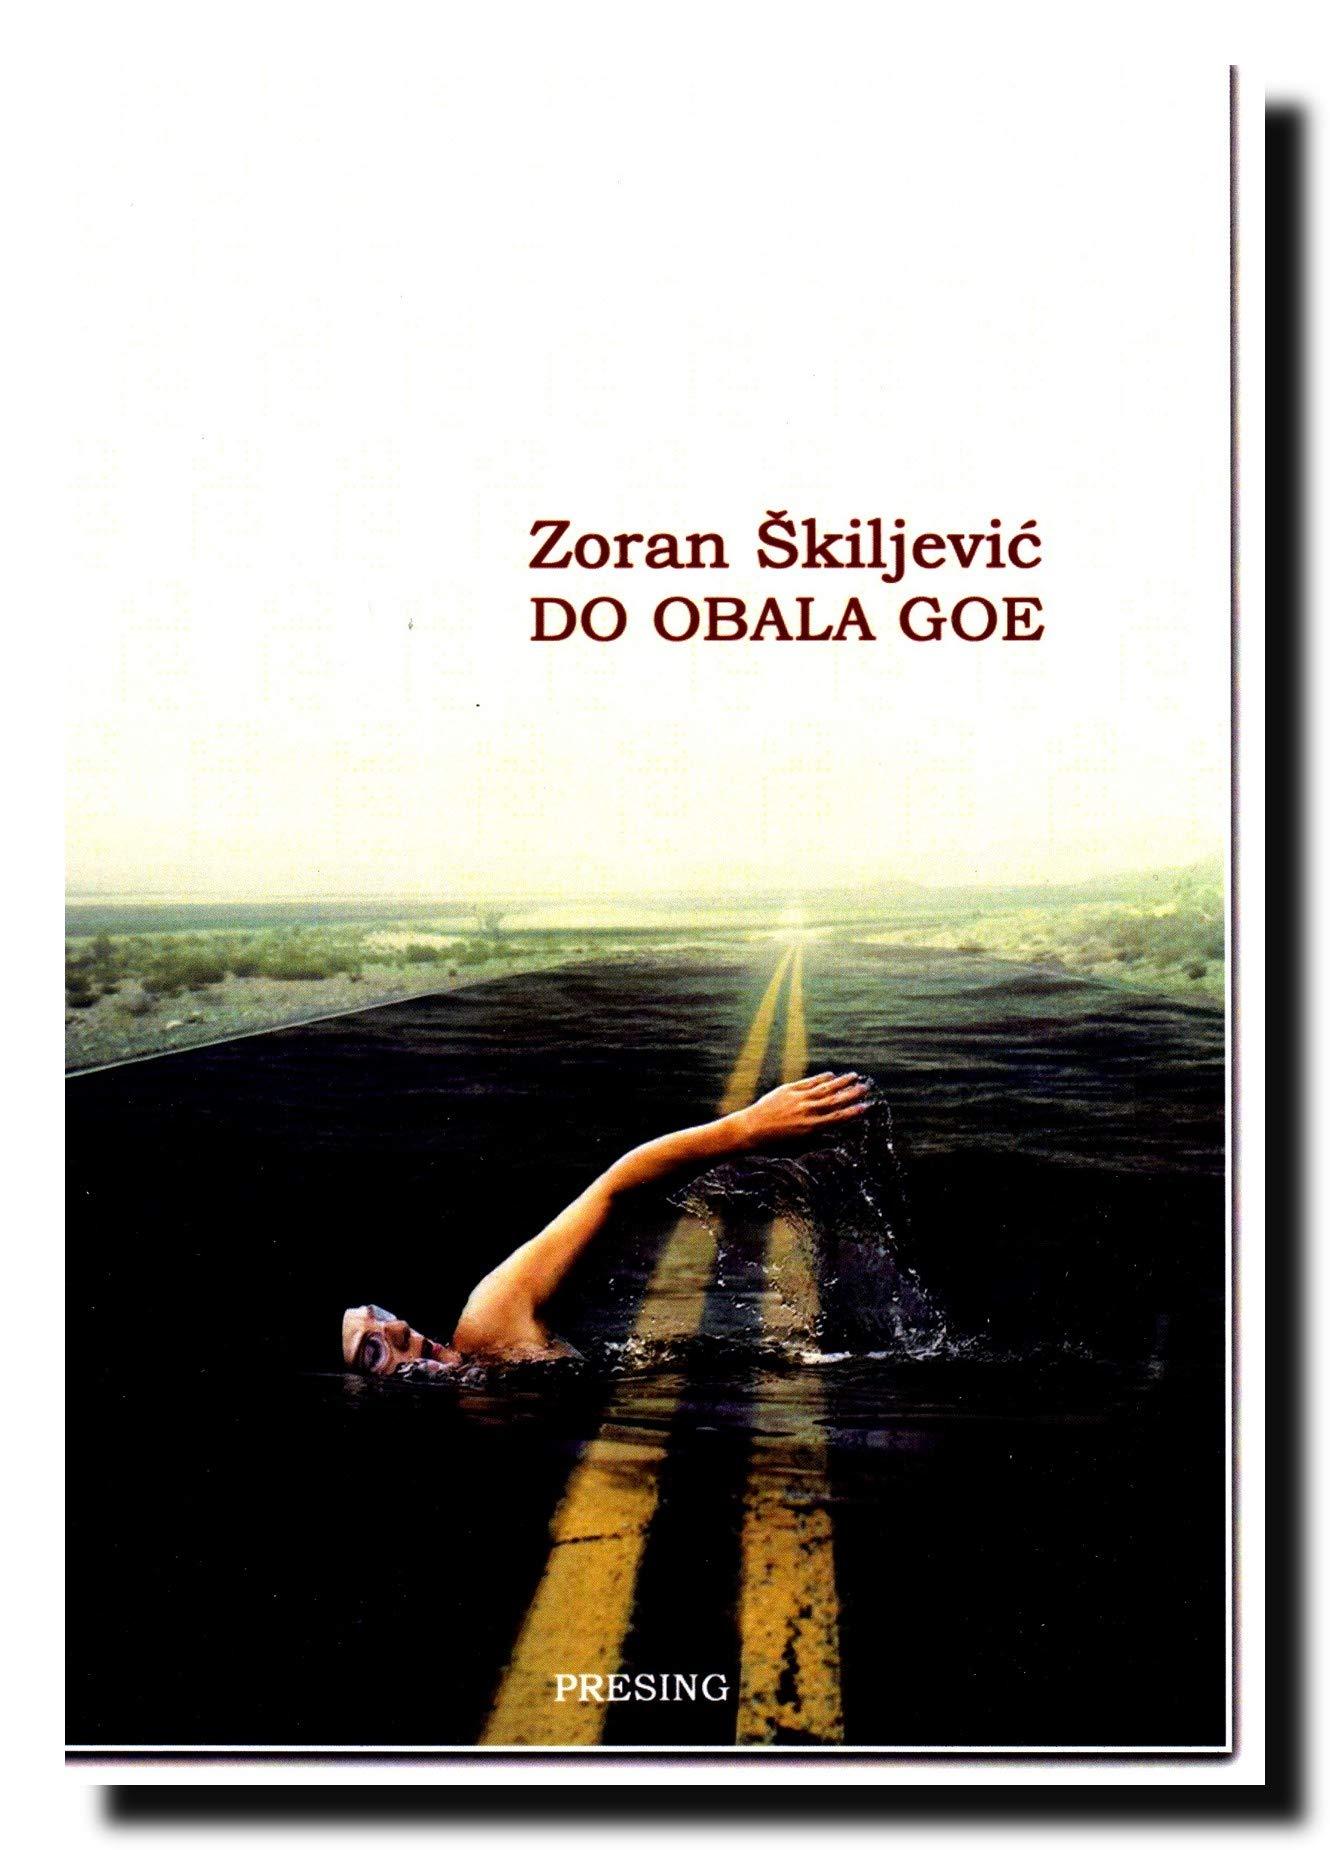 Do obala Goe: Skiljevic Zoran: 9788663412873: Amazon.com: Books